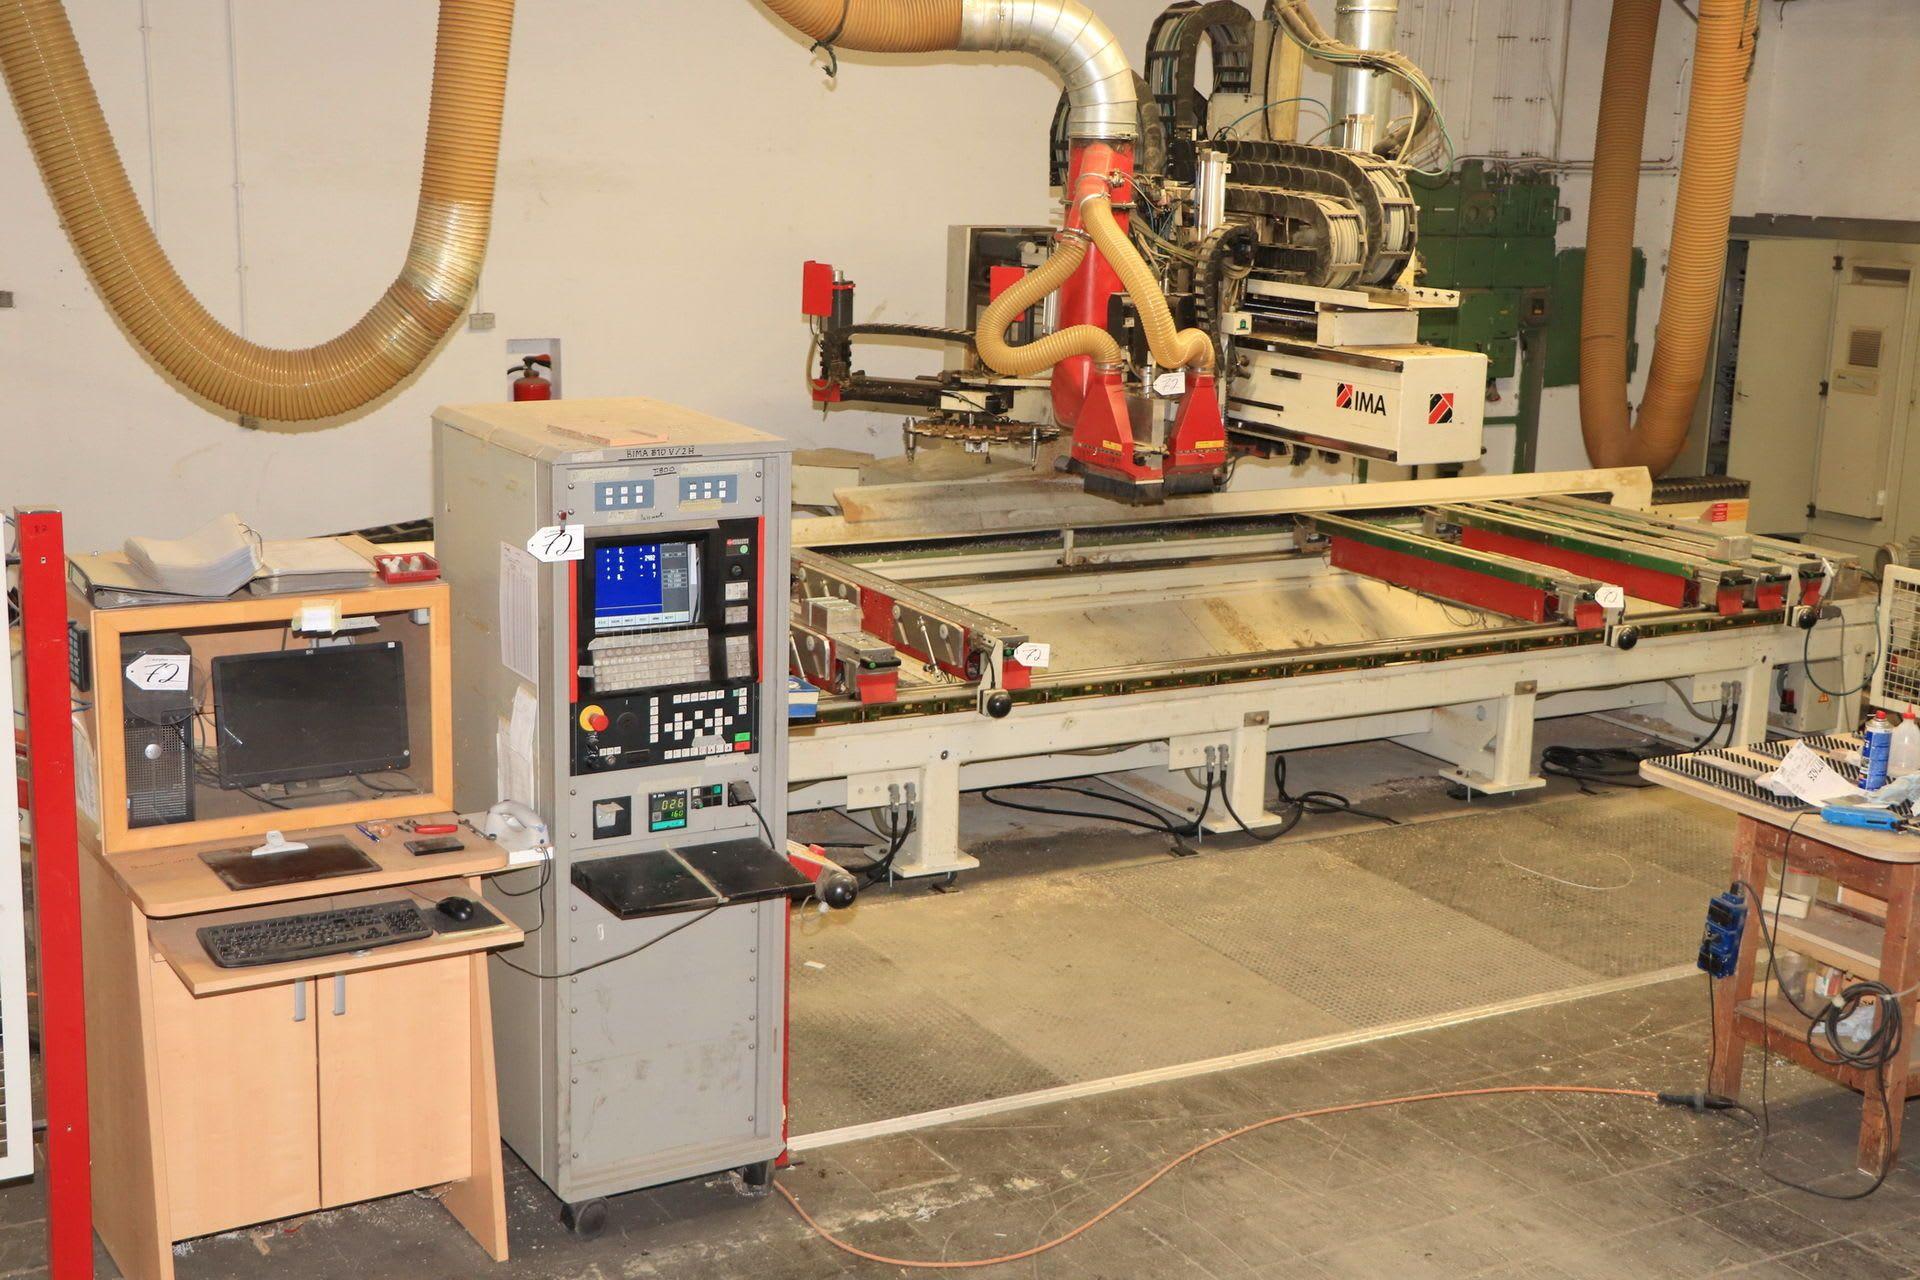 IMA 810 V CNC-Bearbeitungszentrum